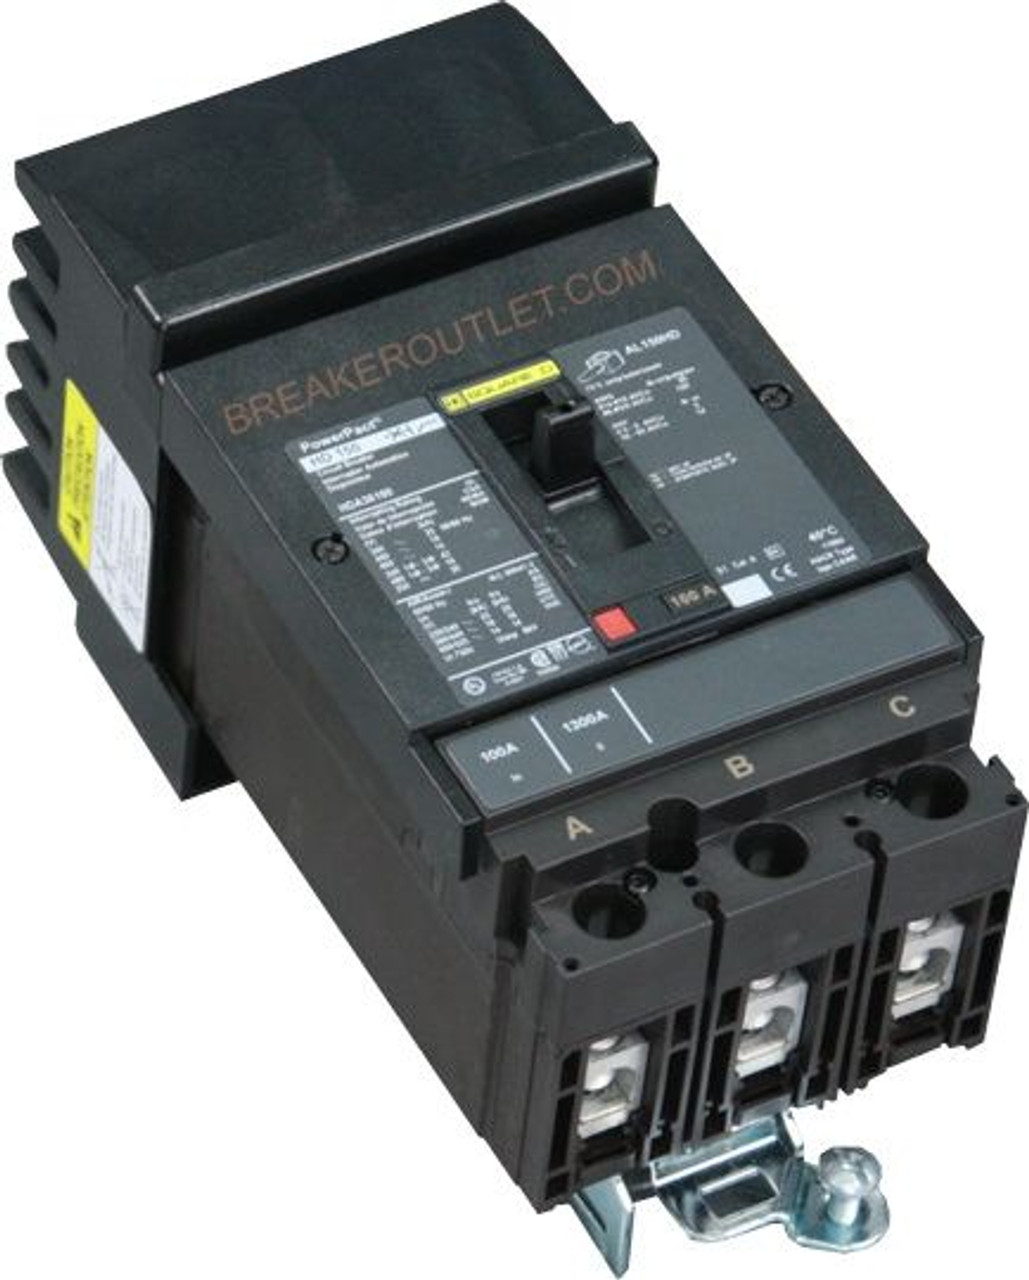 HJA36100 New I-Line model